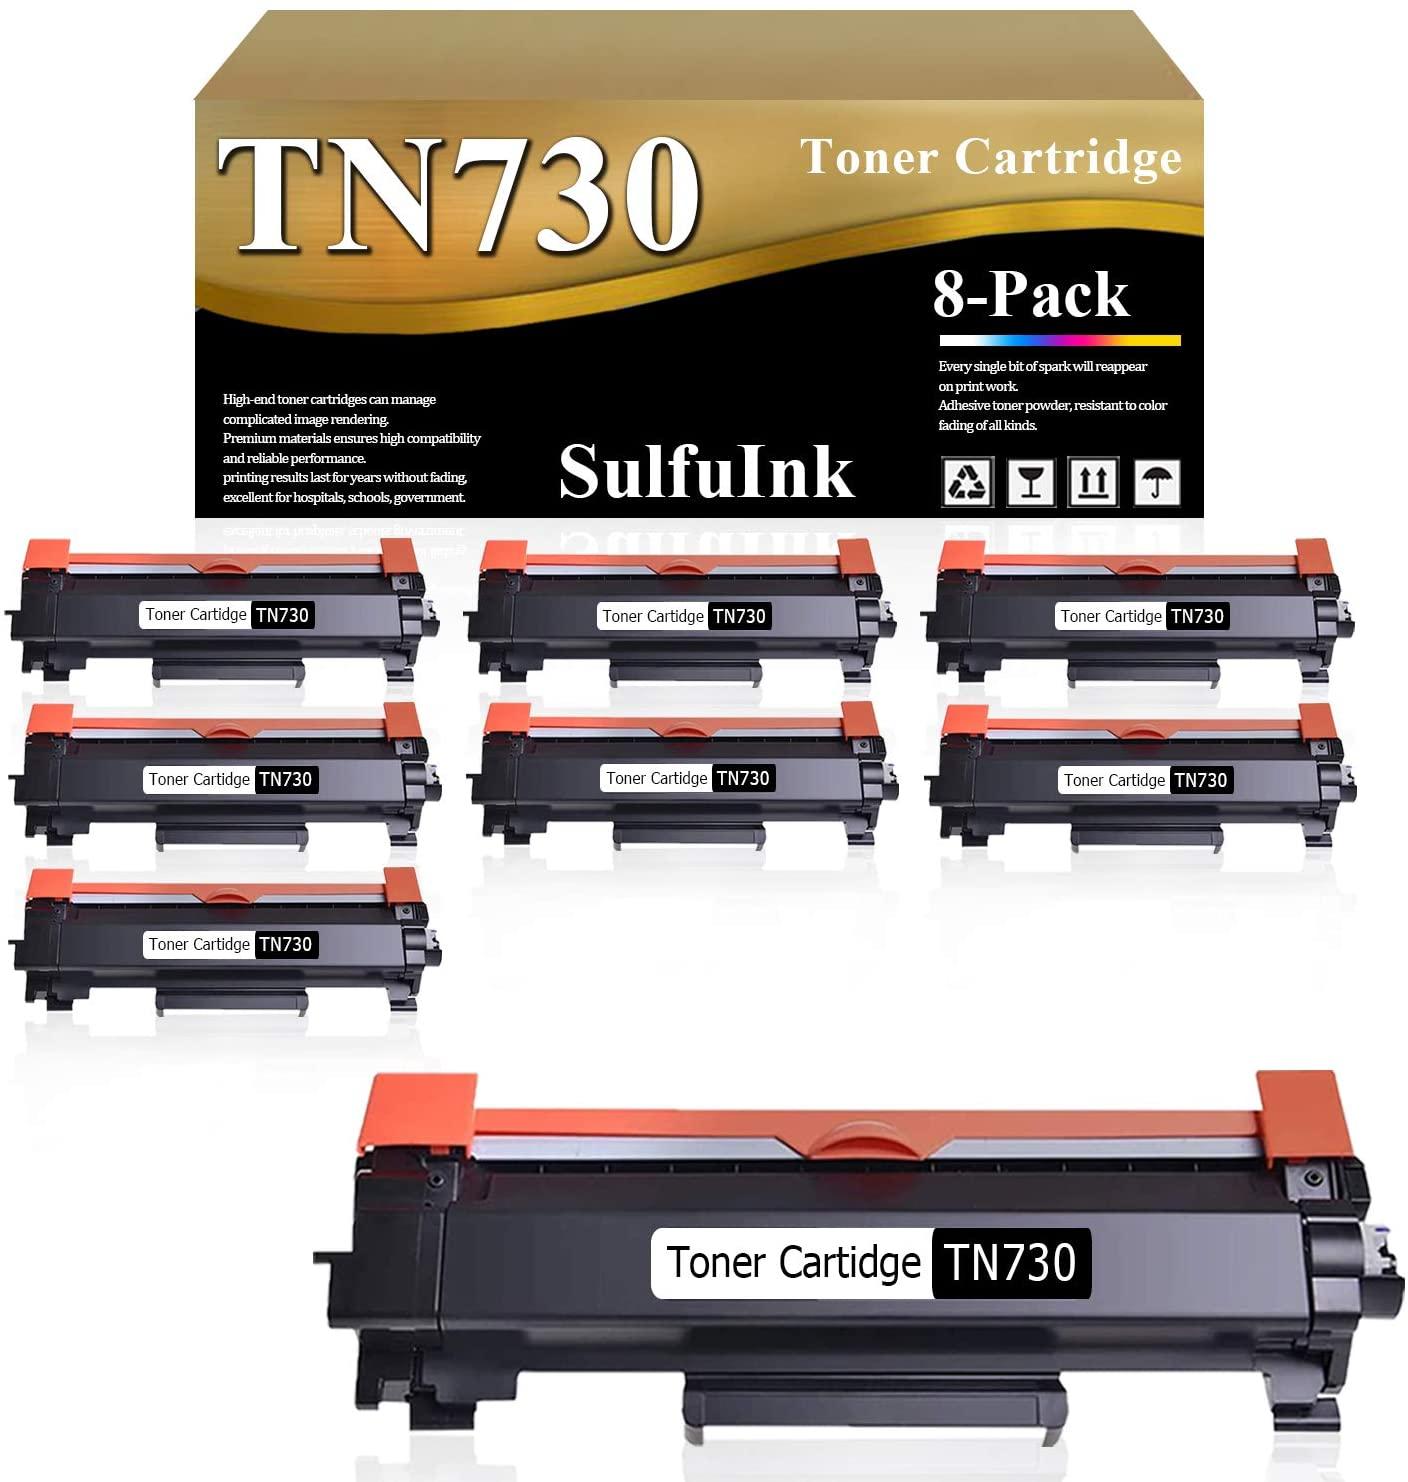 Compatible TN730 TN-730 Toner Cartridge (Black,8-Pack) Replacement for Brother HL-L2350DW L2370DW/DWXL L2390DW L2395DW DCP-L2550DW MFC-L2710DW L2750DW L2750DWXL Laser Printer.